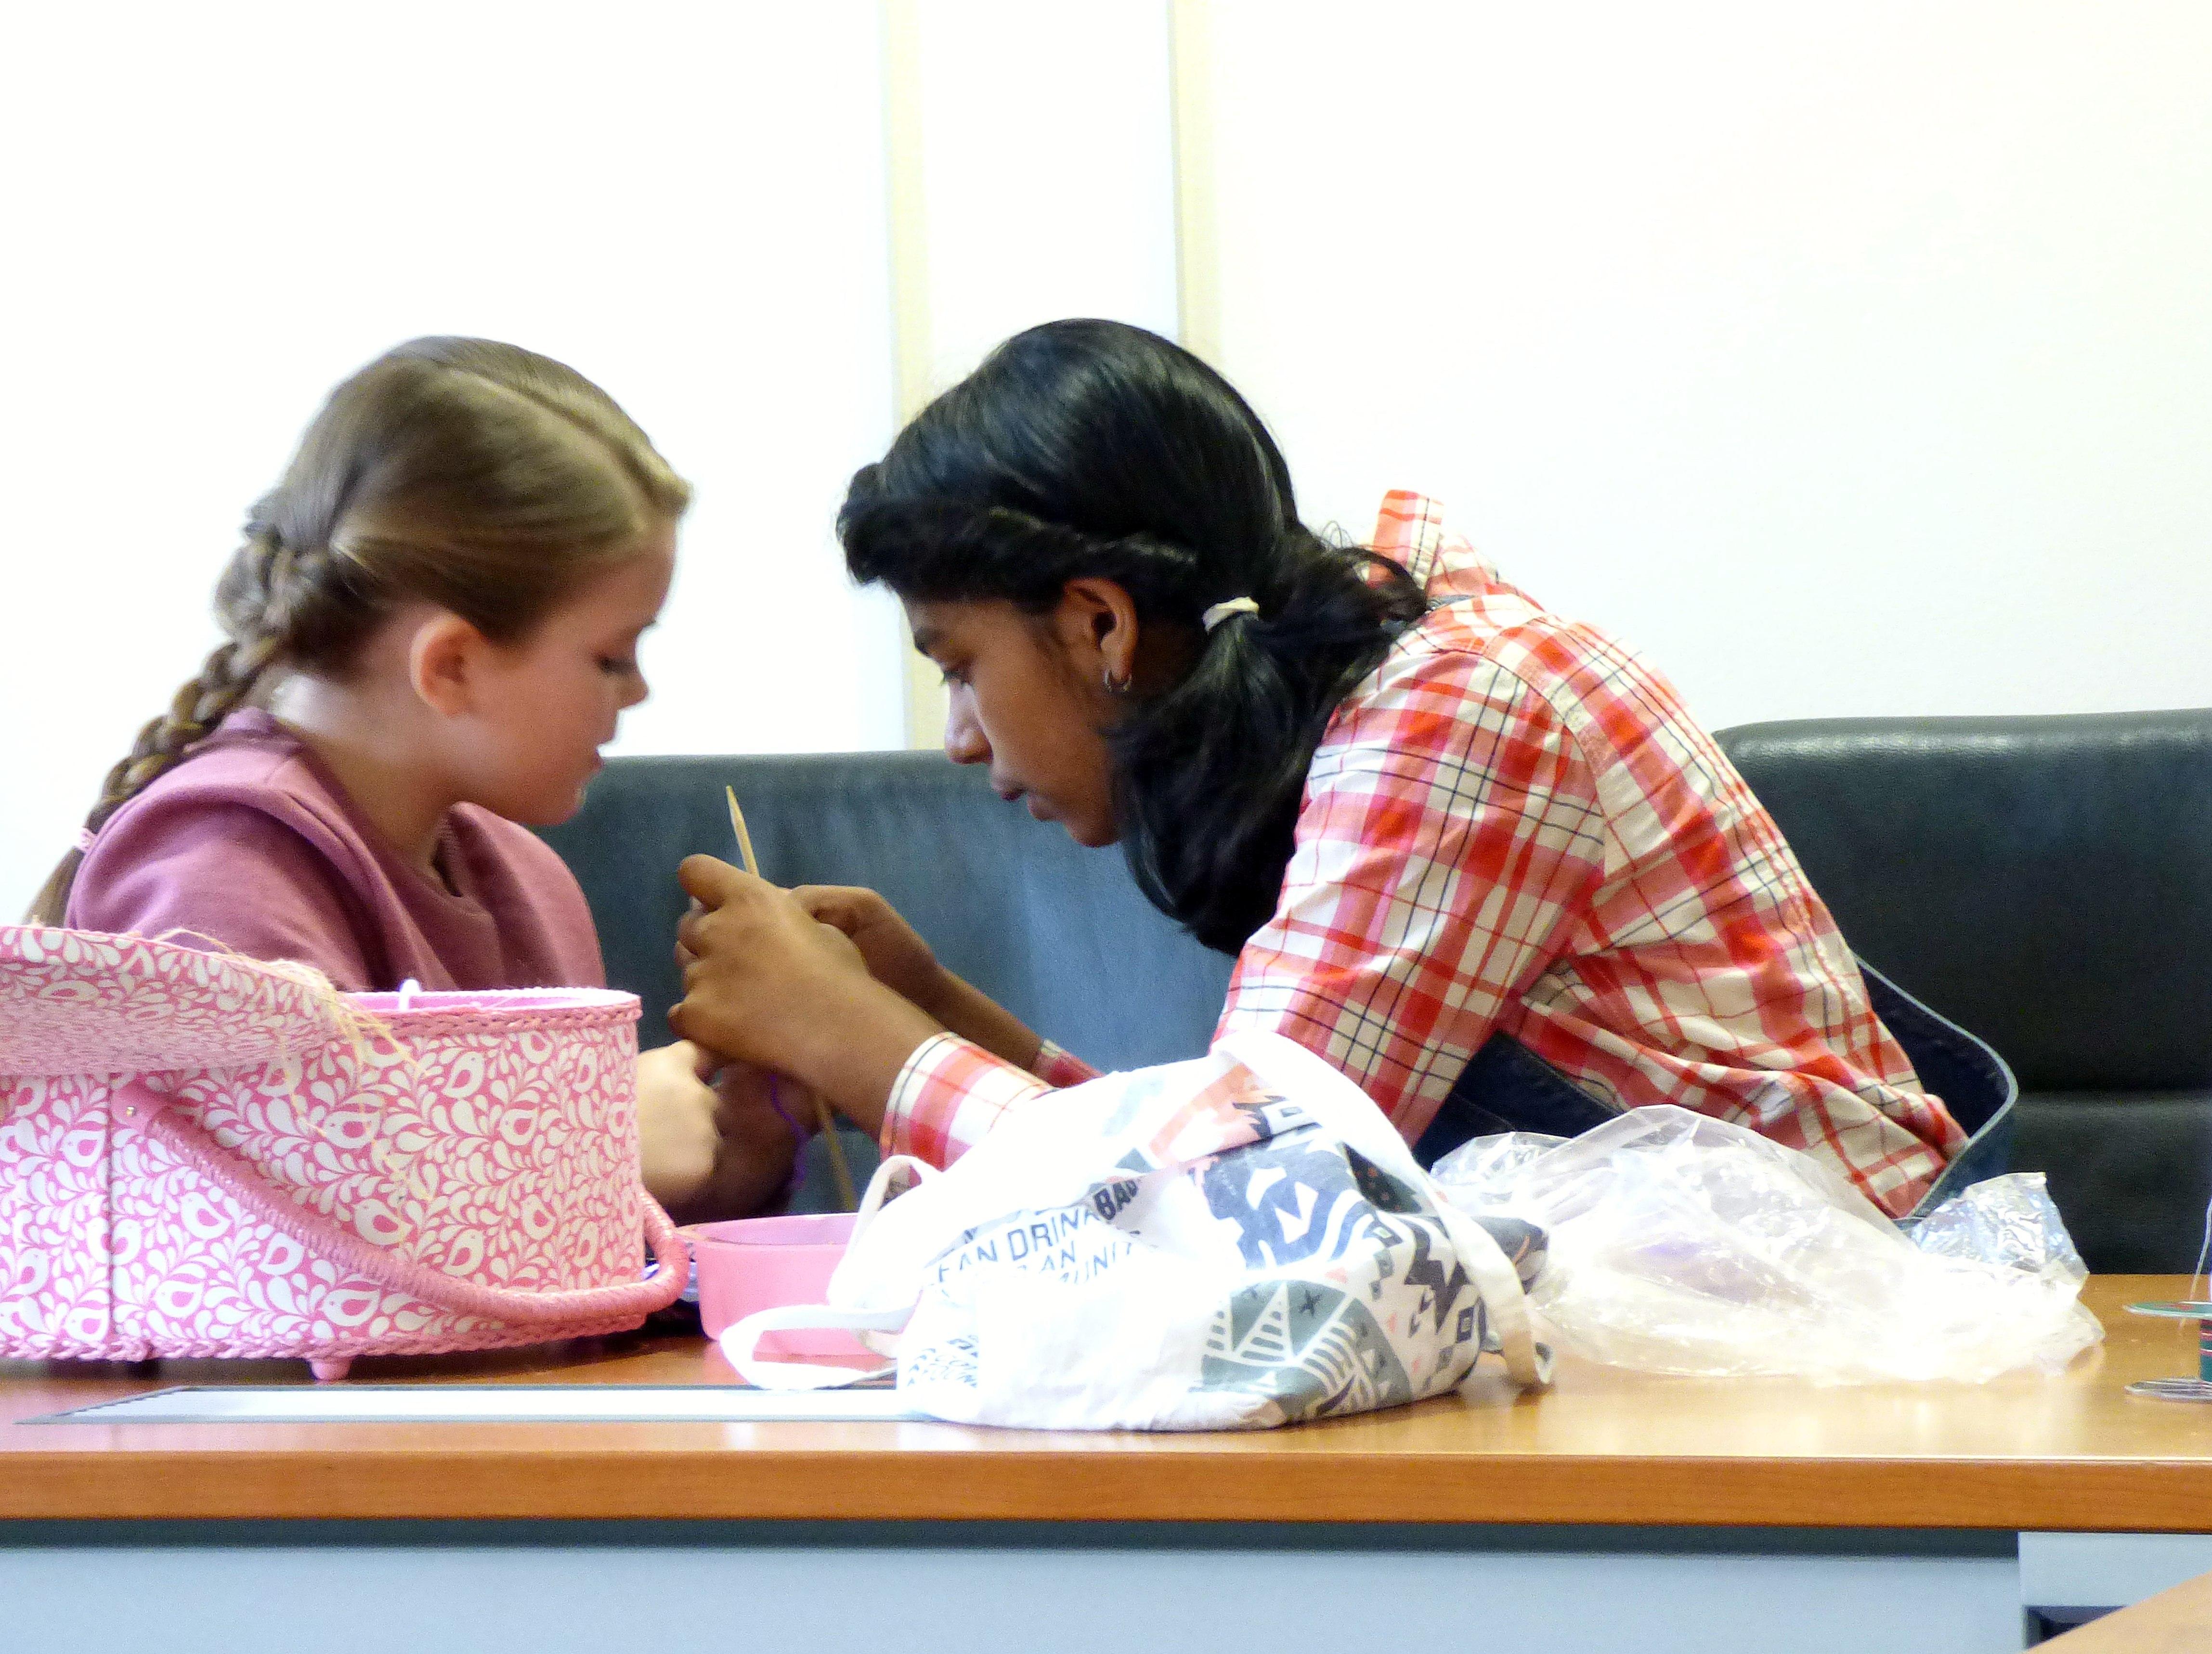 Grace is teaching Bella to knit